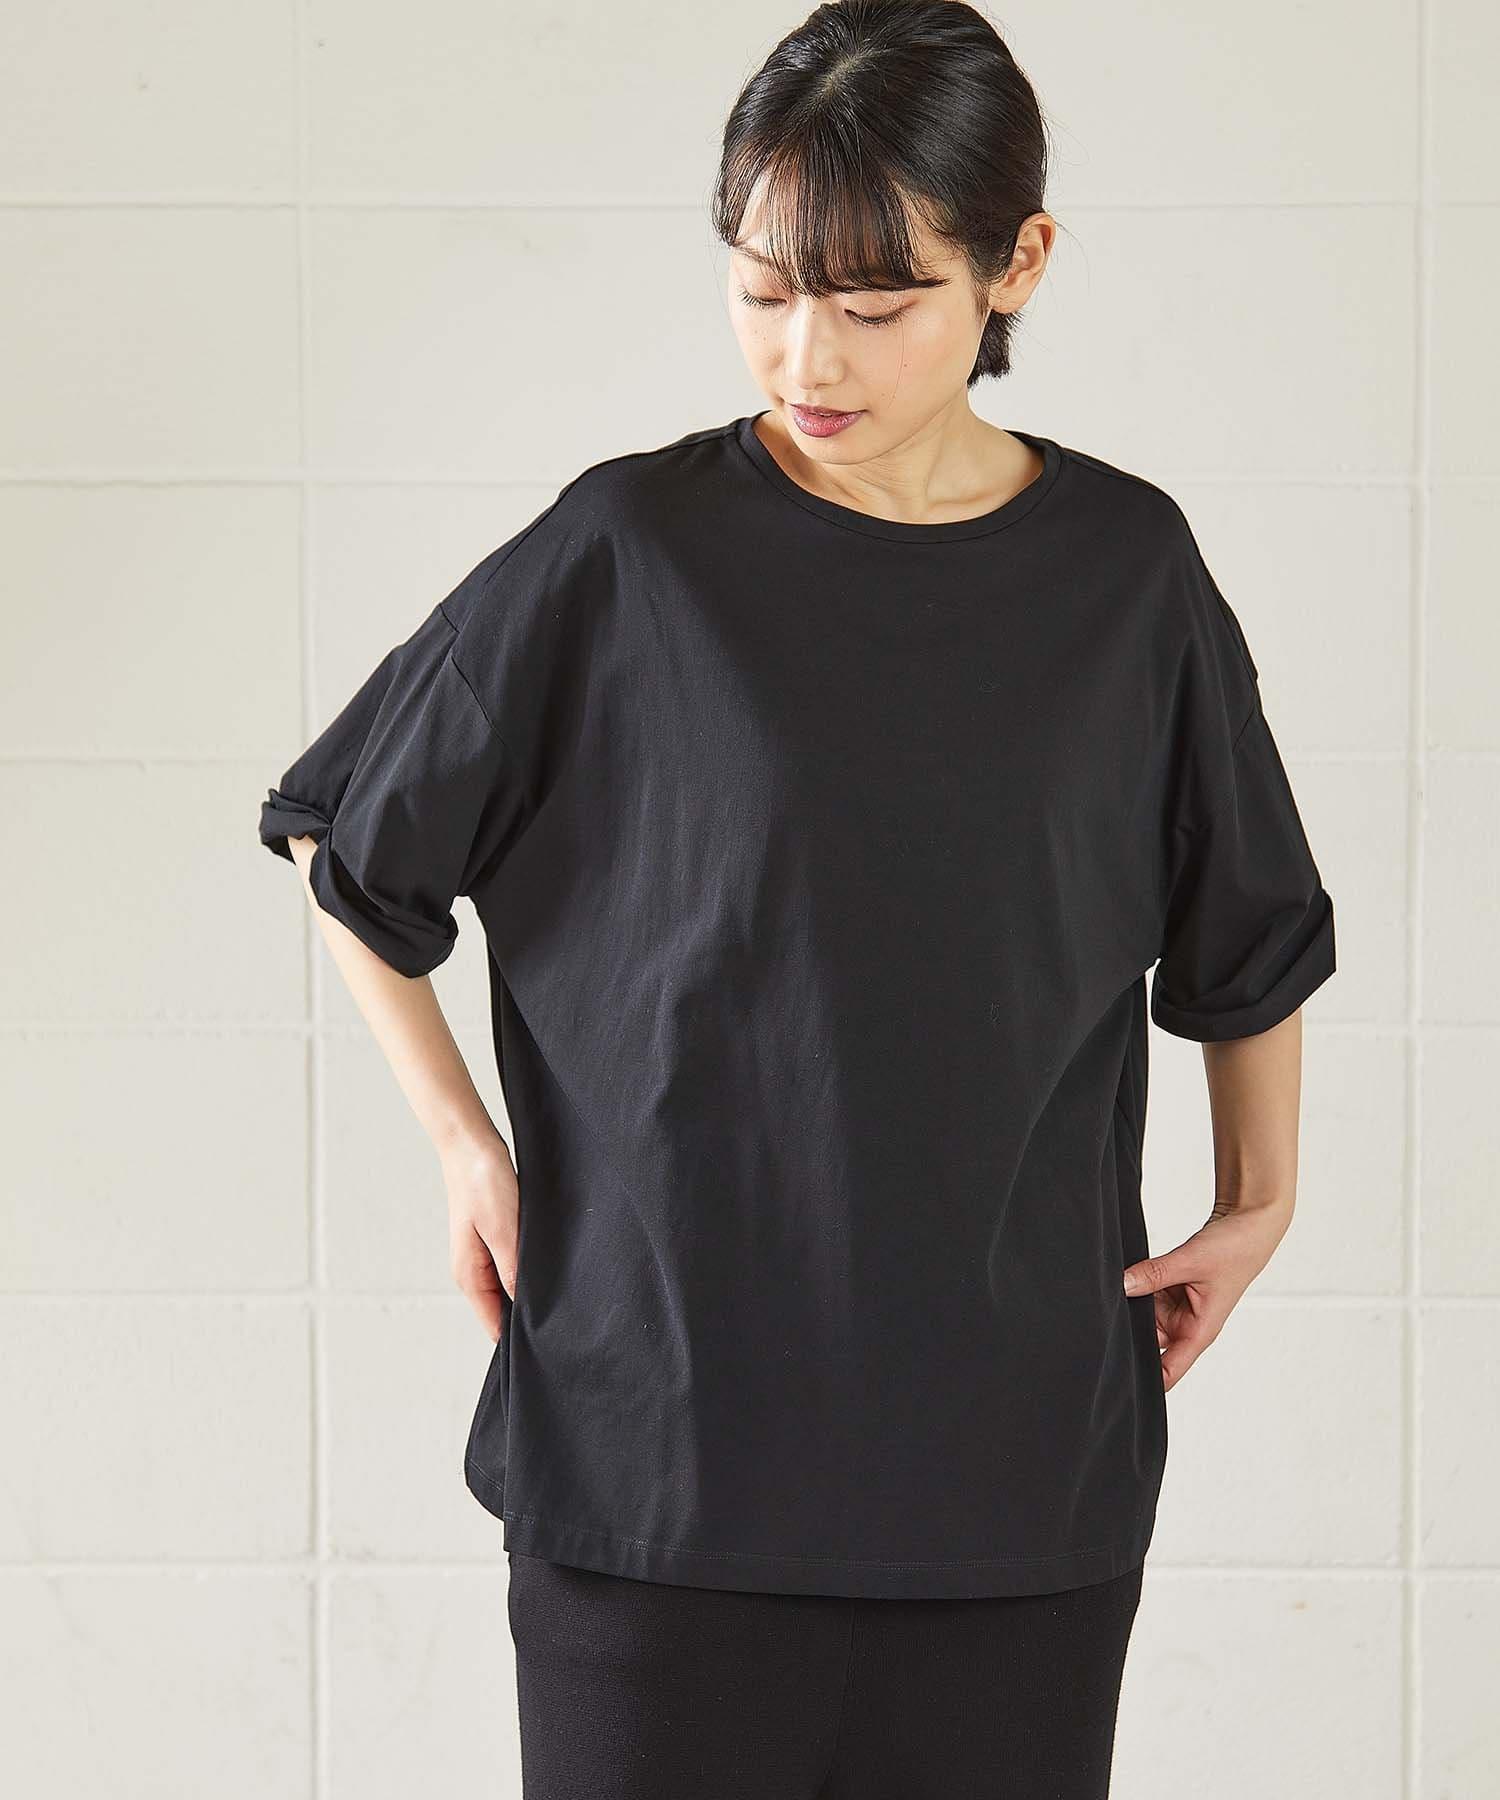 OUVRAGE CLASSE(ウヴラージュクラス) レディース 袖ロールアップTシャツ ブラック